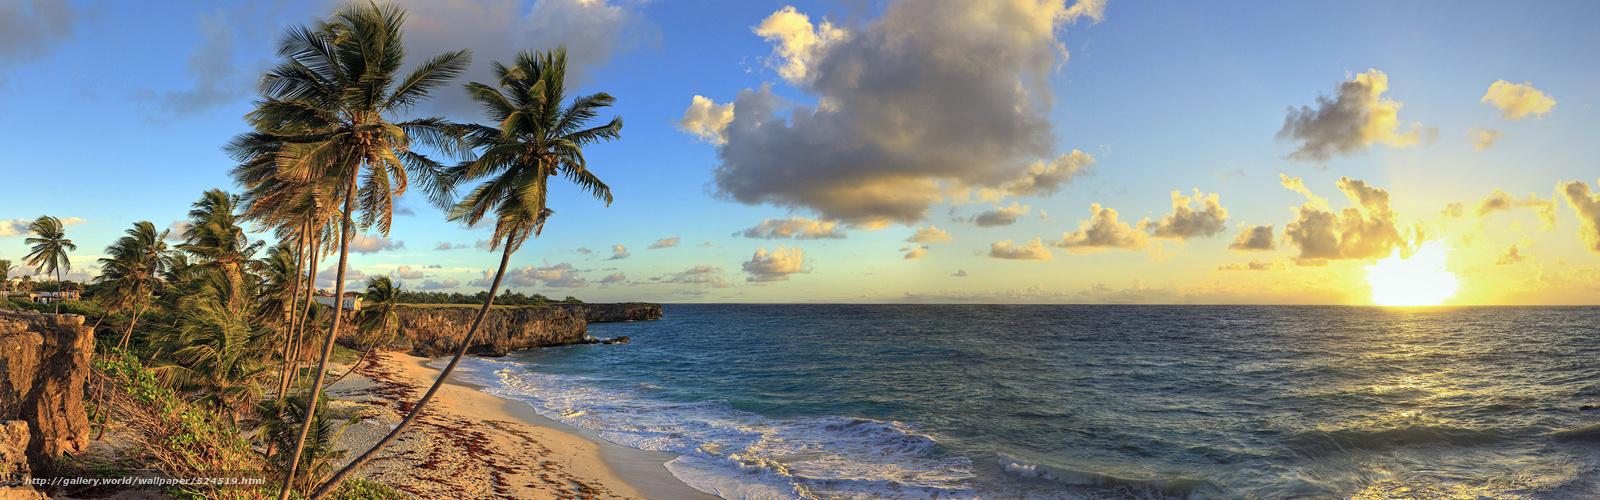 bay beach barbados caribbean caribbean sea desktop wallpaper 1600x500